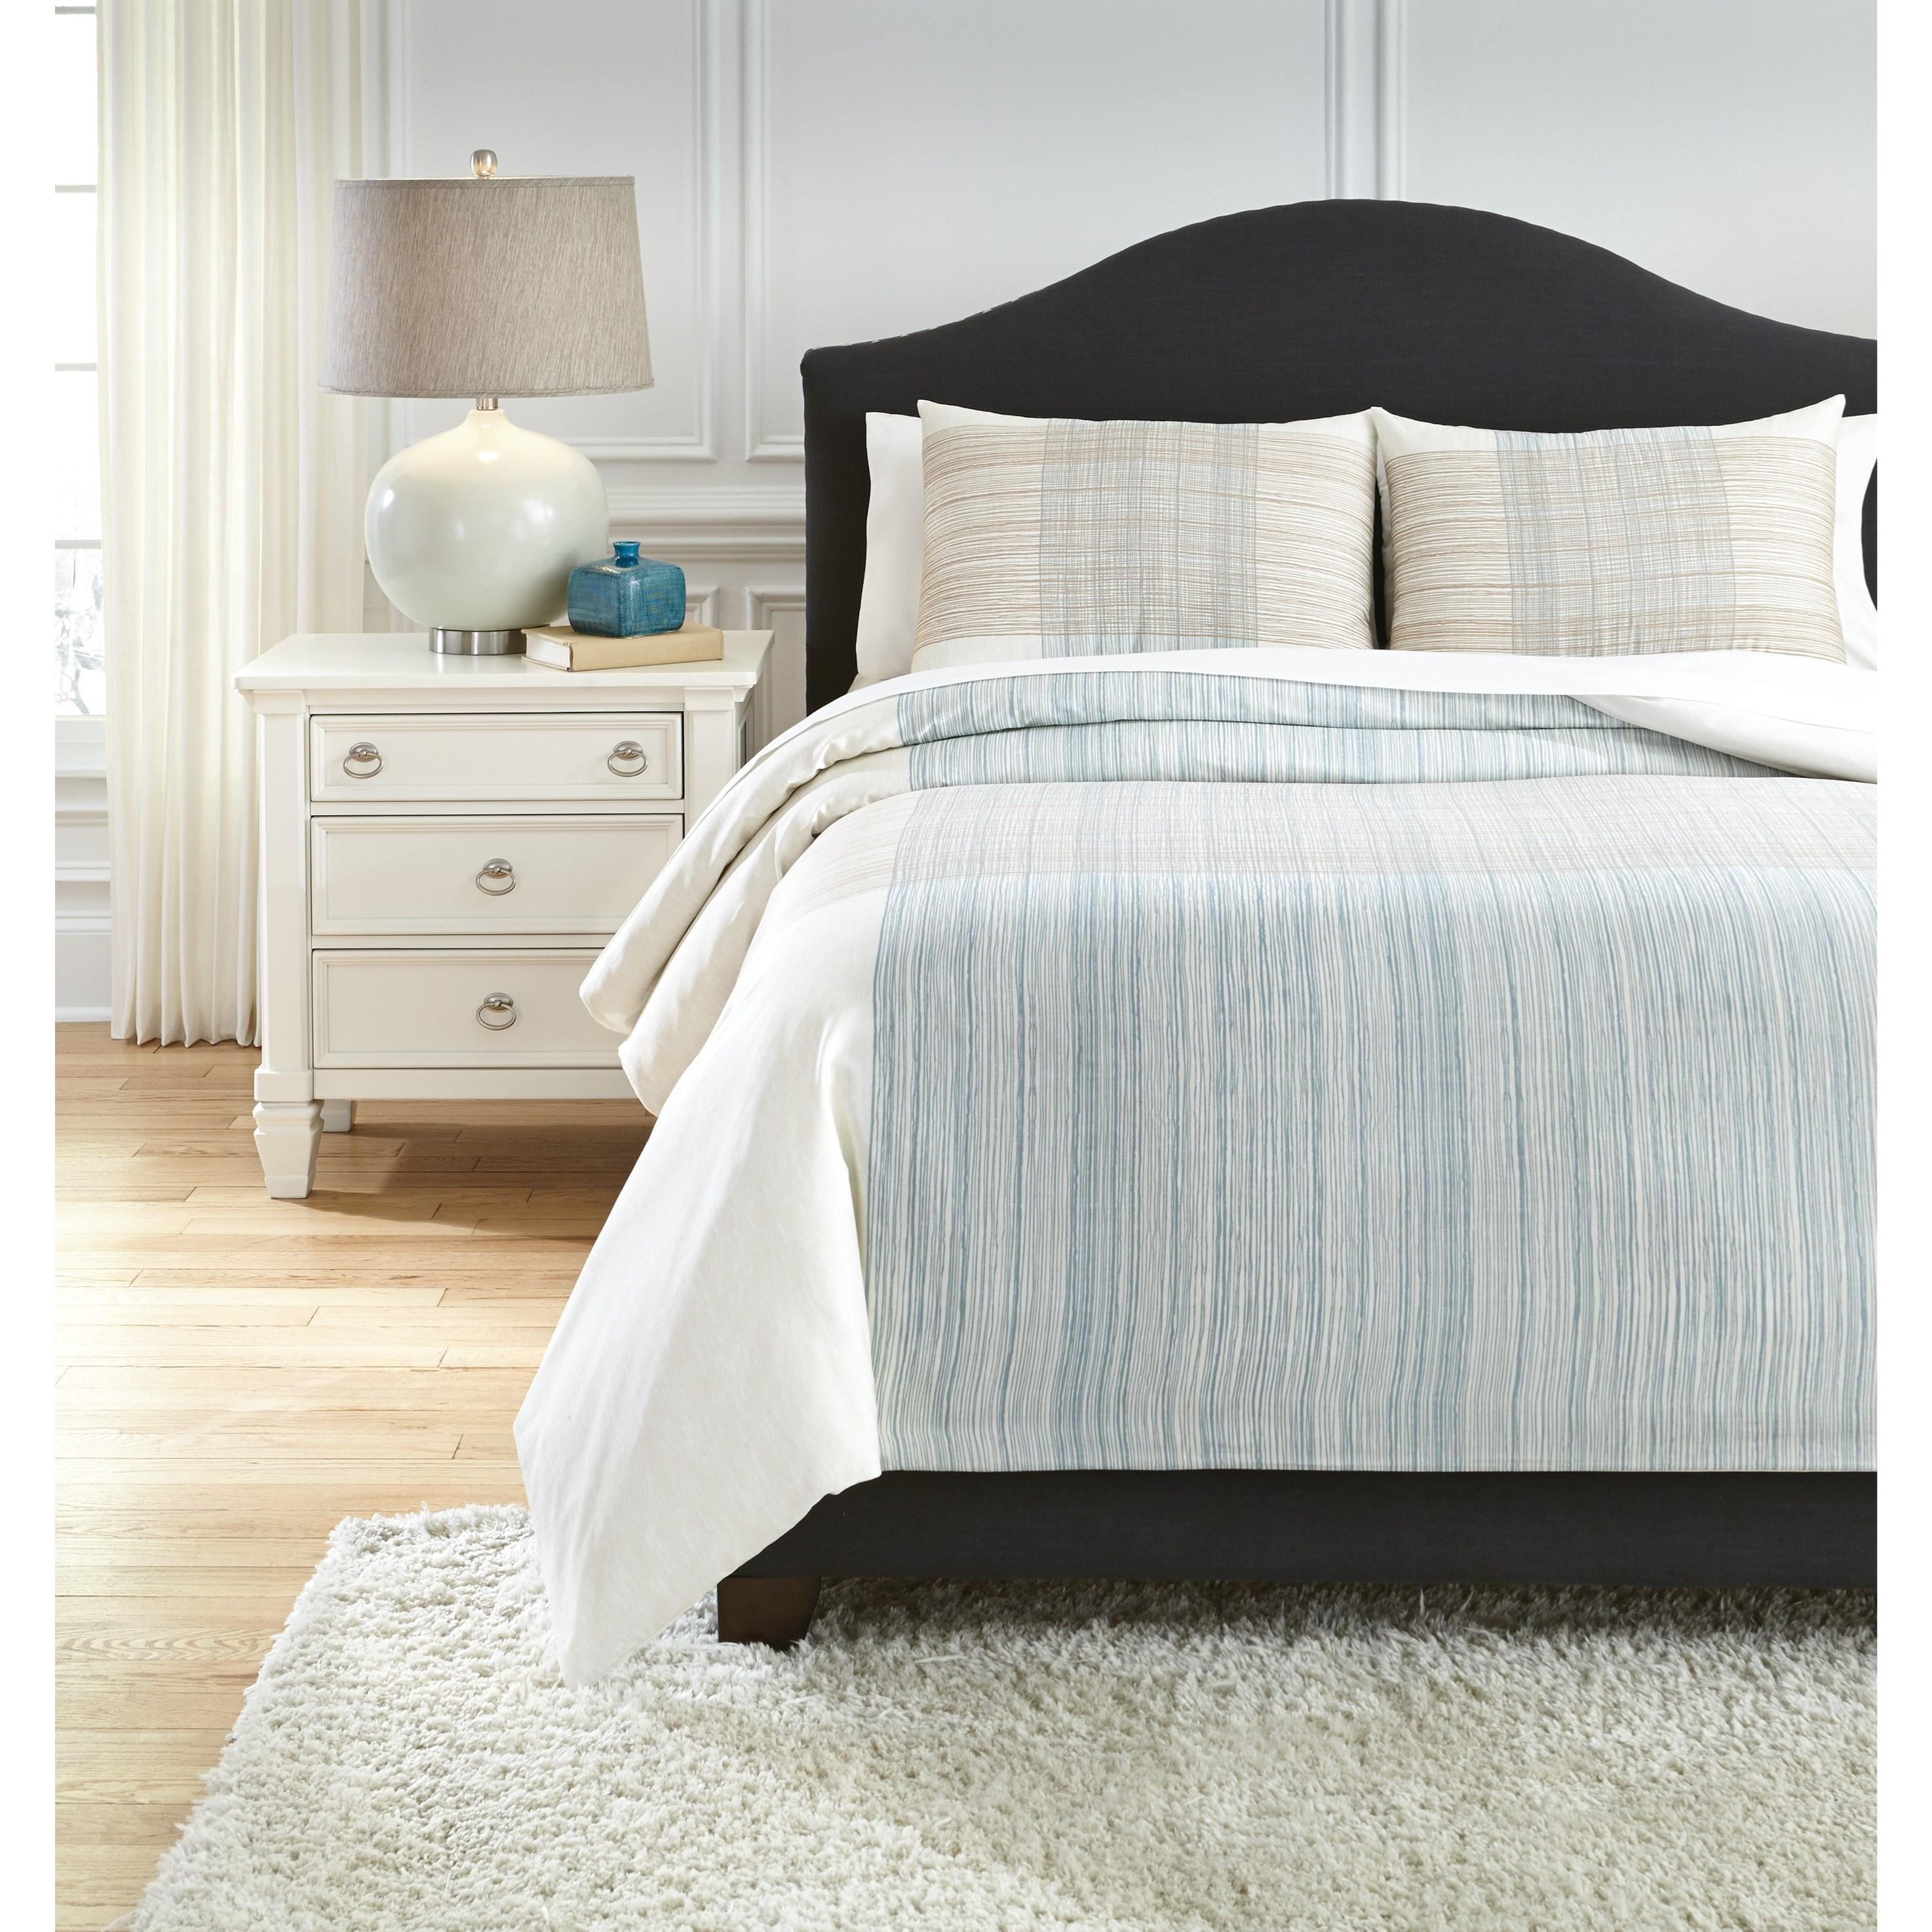 Signature Design by Ashley Bedding Sets Queen Jenae Blue/Brown Duvet Cover Set - Item Number: Q346023Q